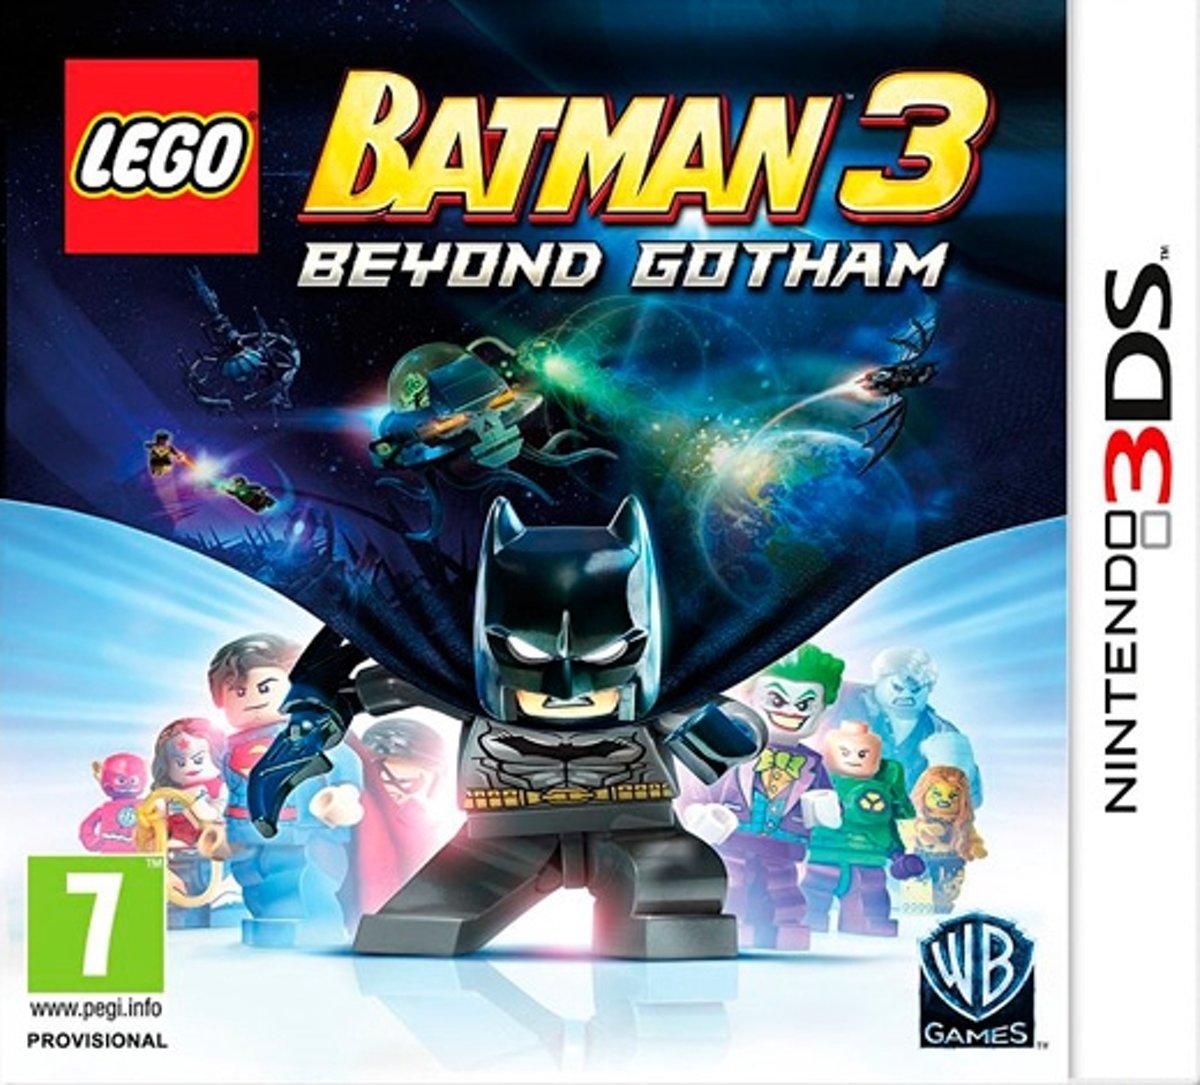 Lego Batman 3: Beyond Gotham /3DS kopen